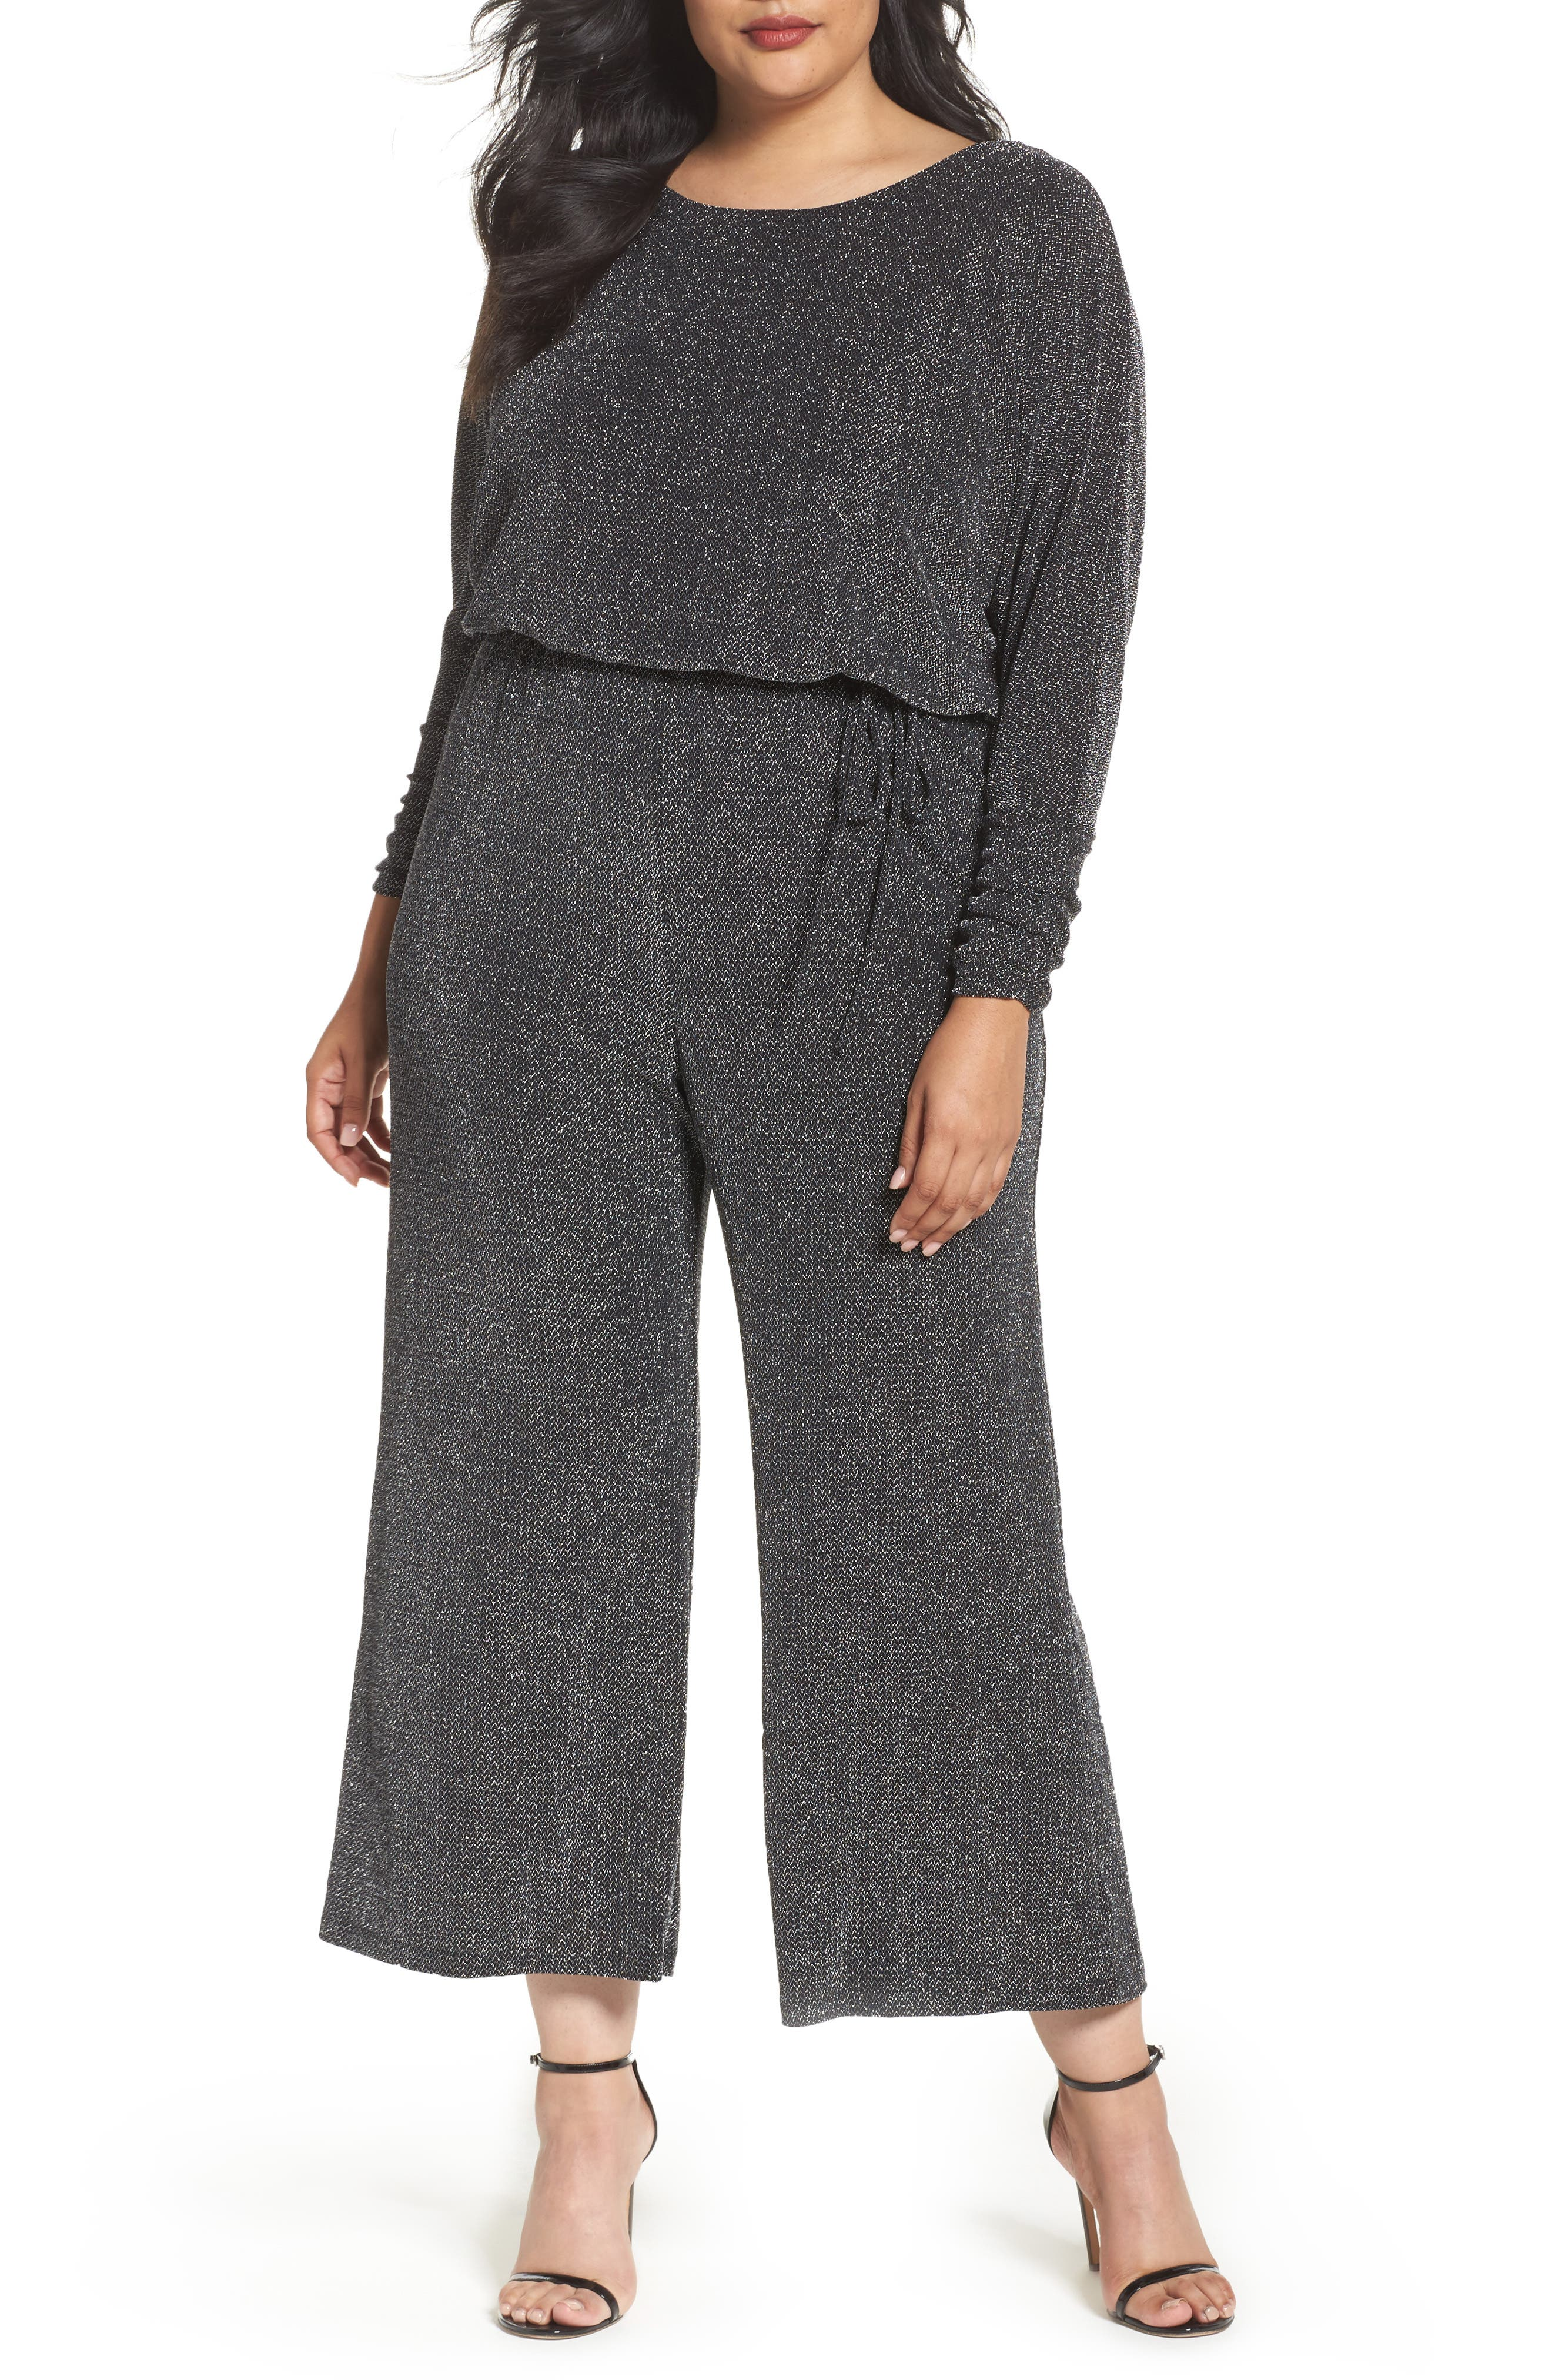 Alternate Image 1 Selected - Eliza J Metallic Knit Jumpsuit (Plus Size)